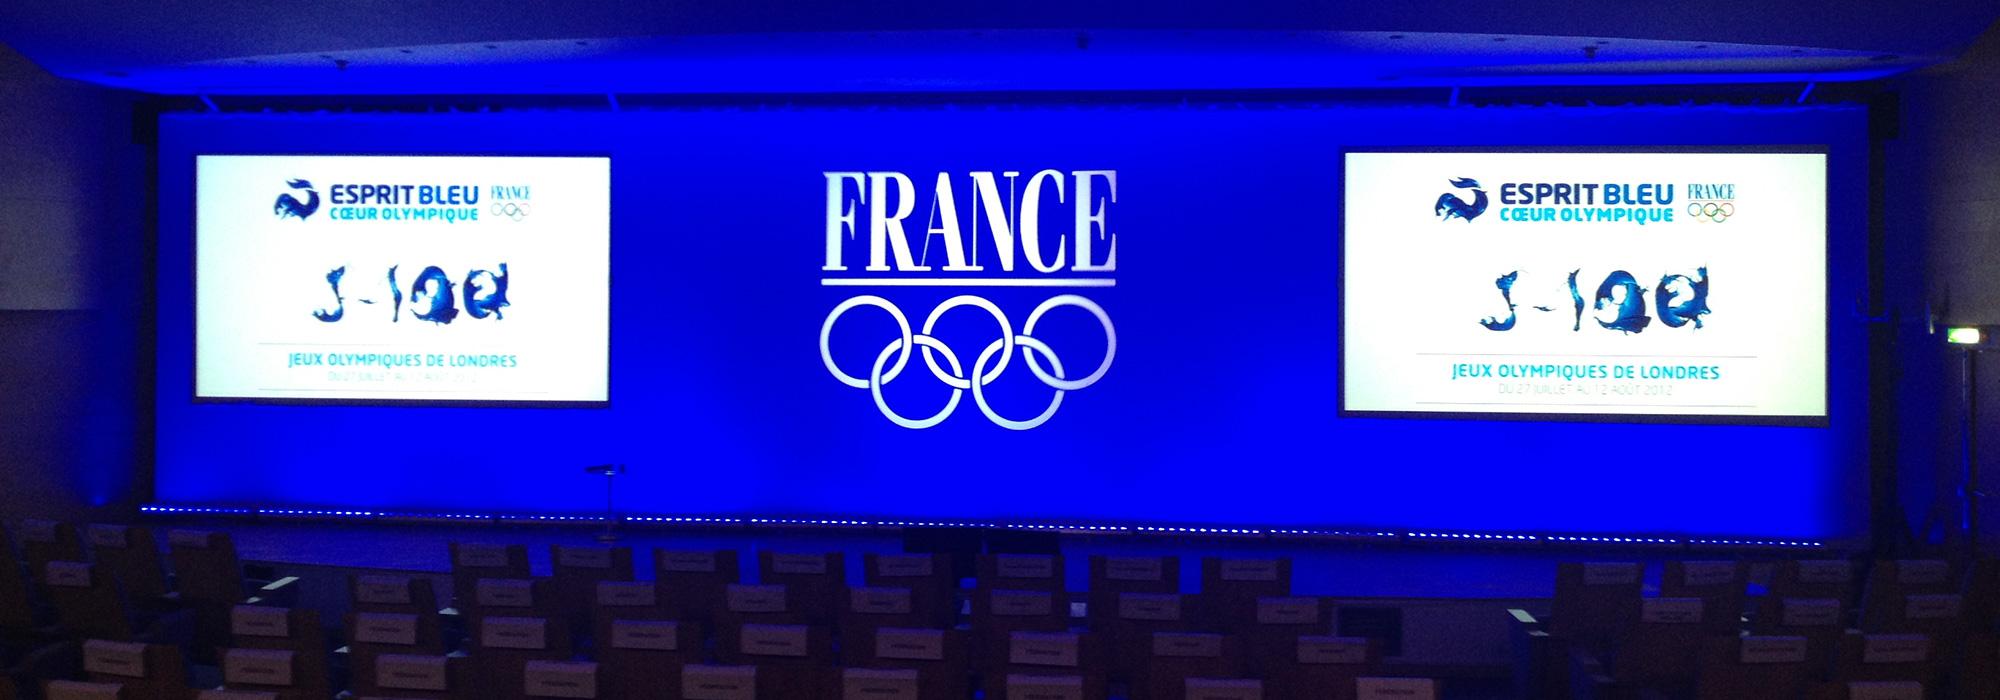 artcomvideo-comite-olympique-1